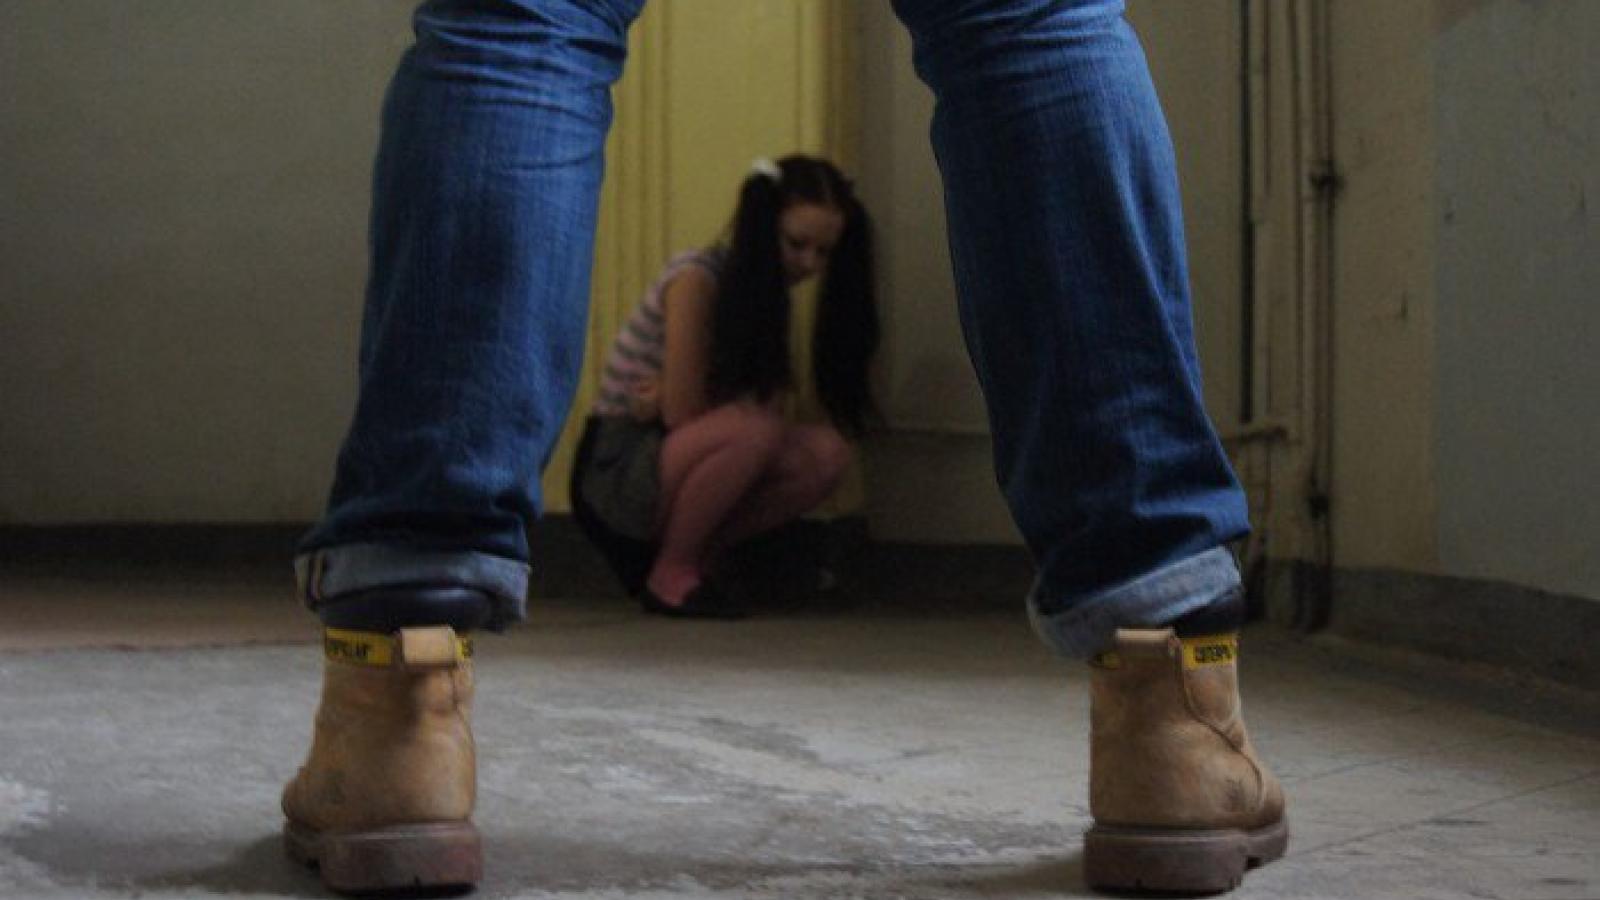 24-летний вологжанин обнажался перед школьницами